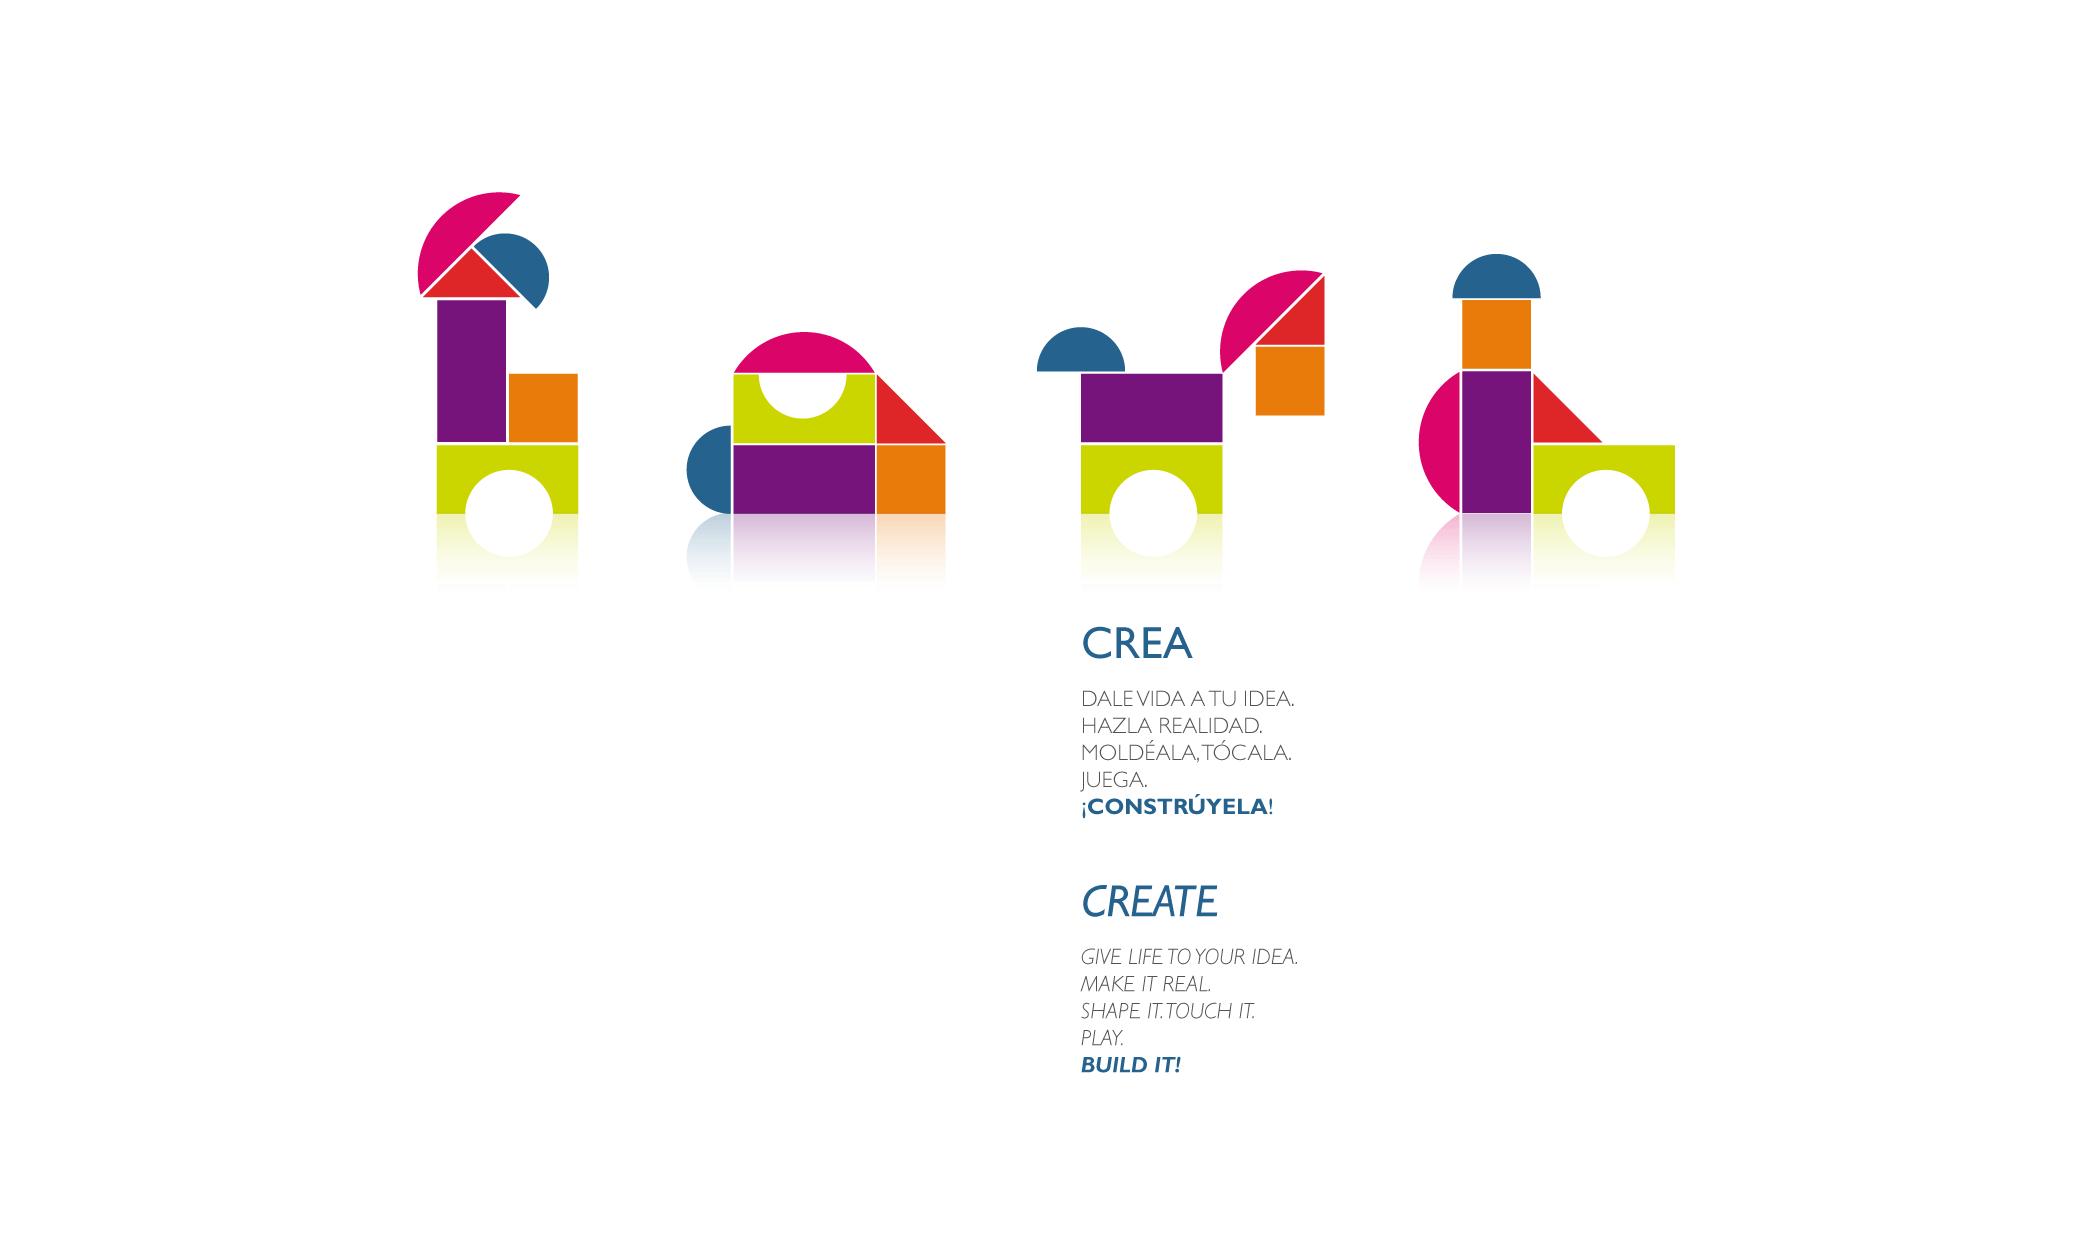 Catchy Design Home Page. Crea-Create